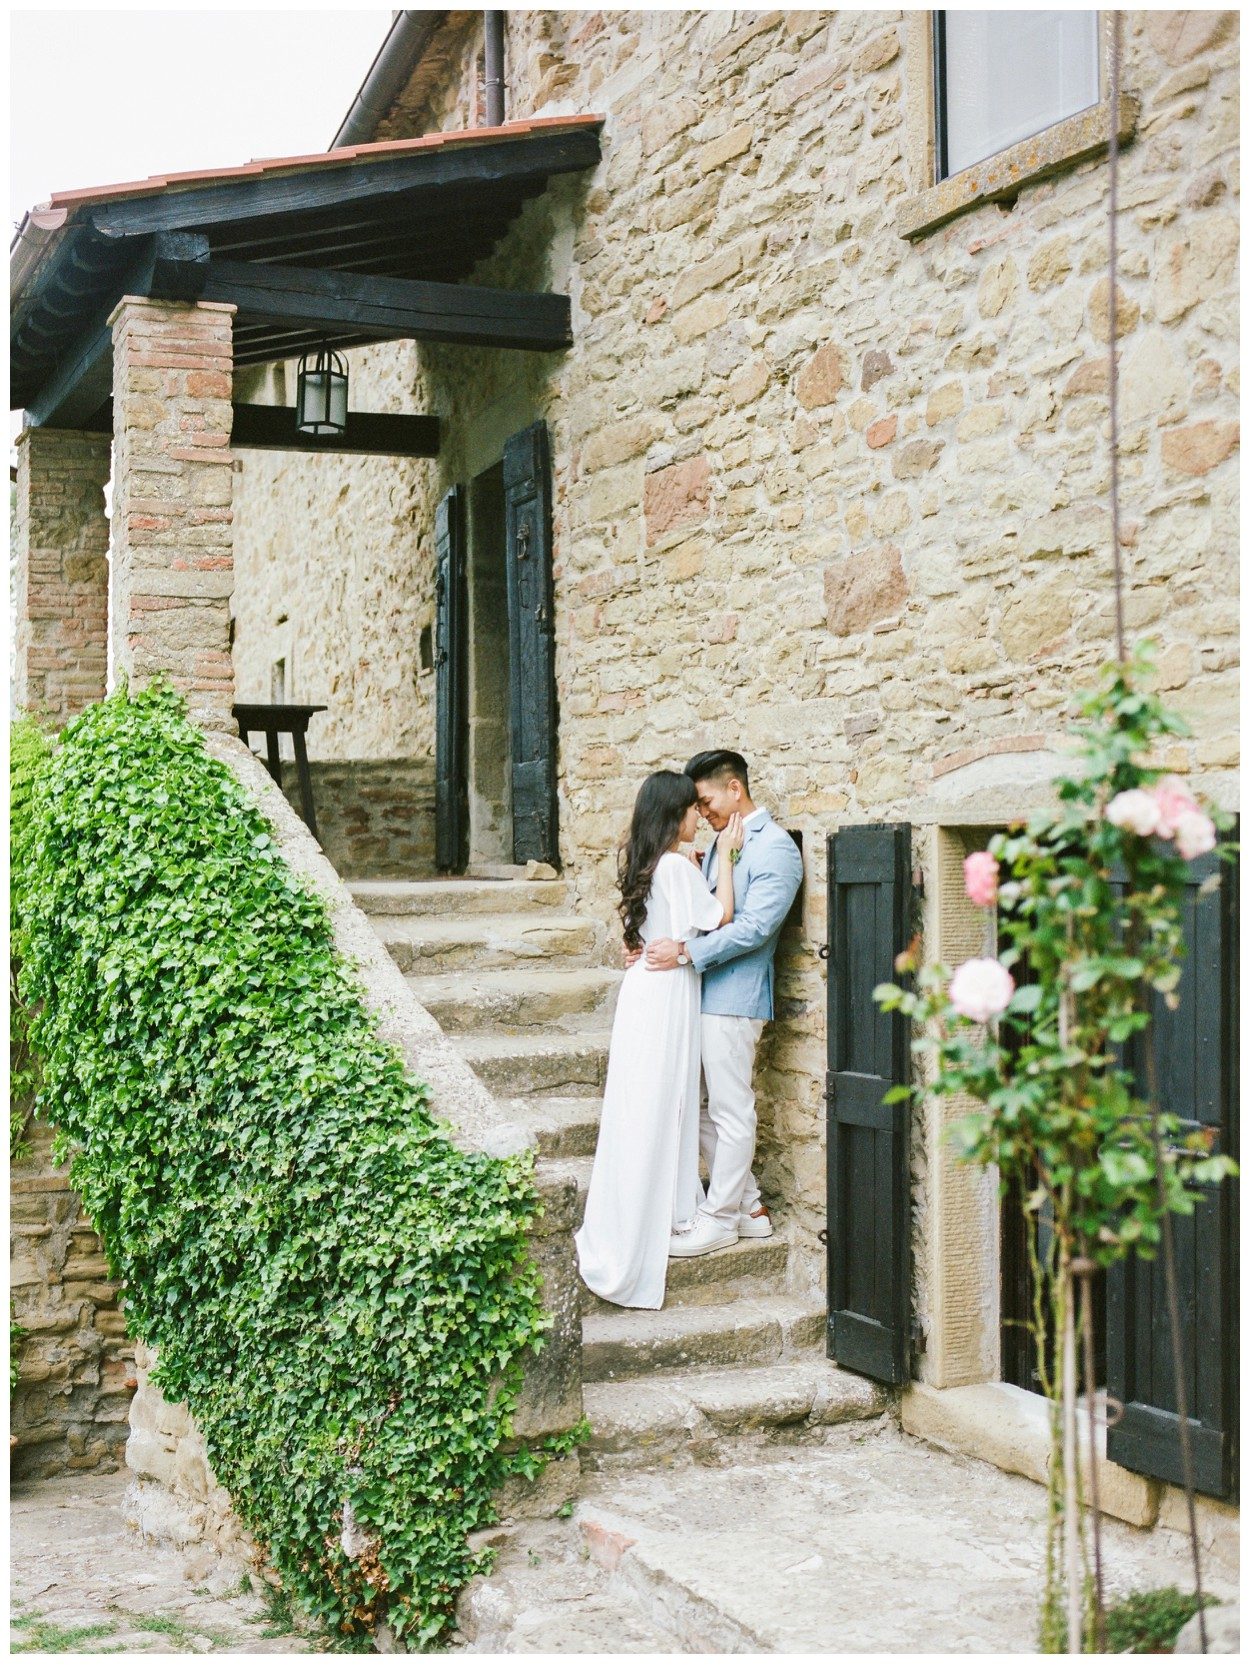 Spring Engagement at Villa Montanare in Cortona Tuscany, Italy by fine art wedding photographer Lissa Ryan Photography